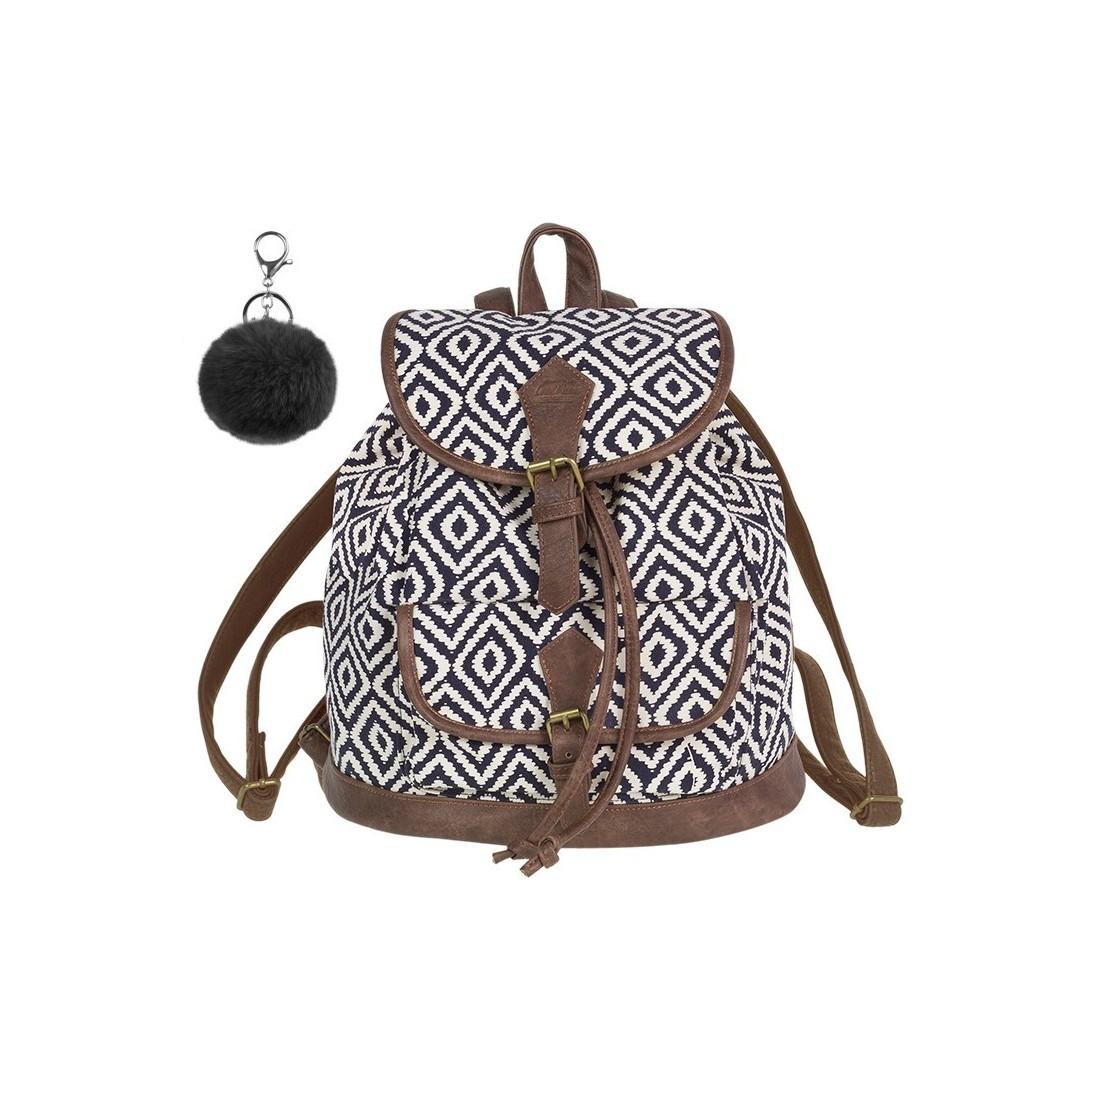 47e0c81e0d9f8 Plecak vintage CoolPack CP FIESTA INDIGO czarno-białe romby - A137 + GRATIS